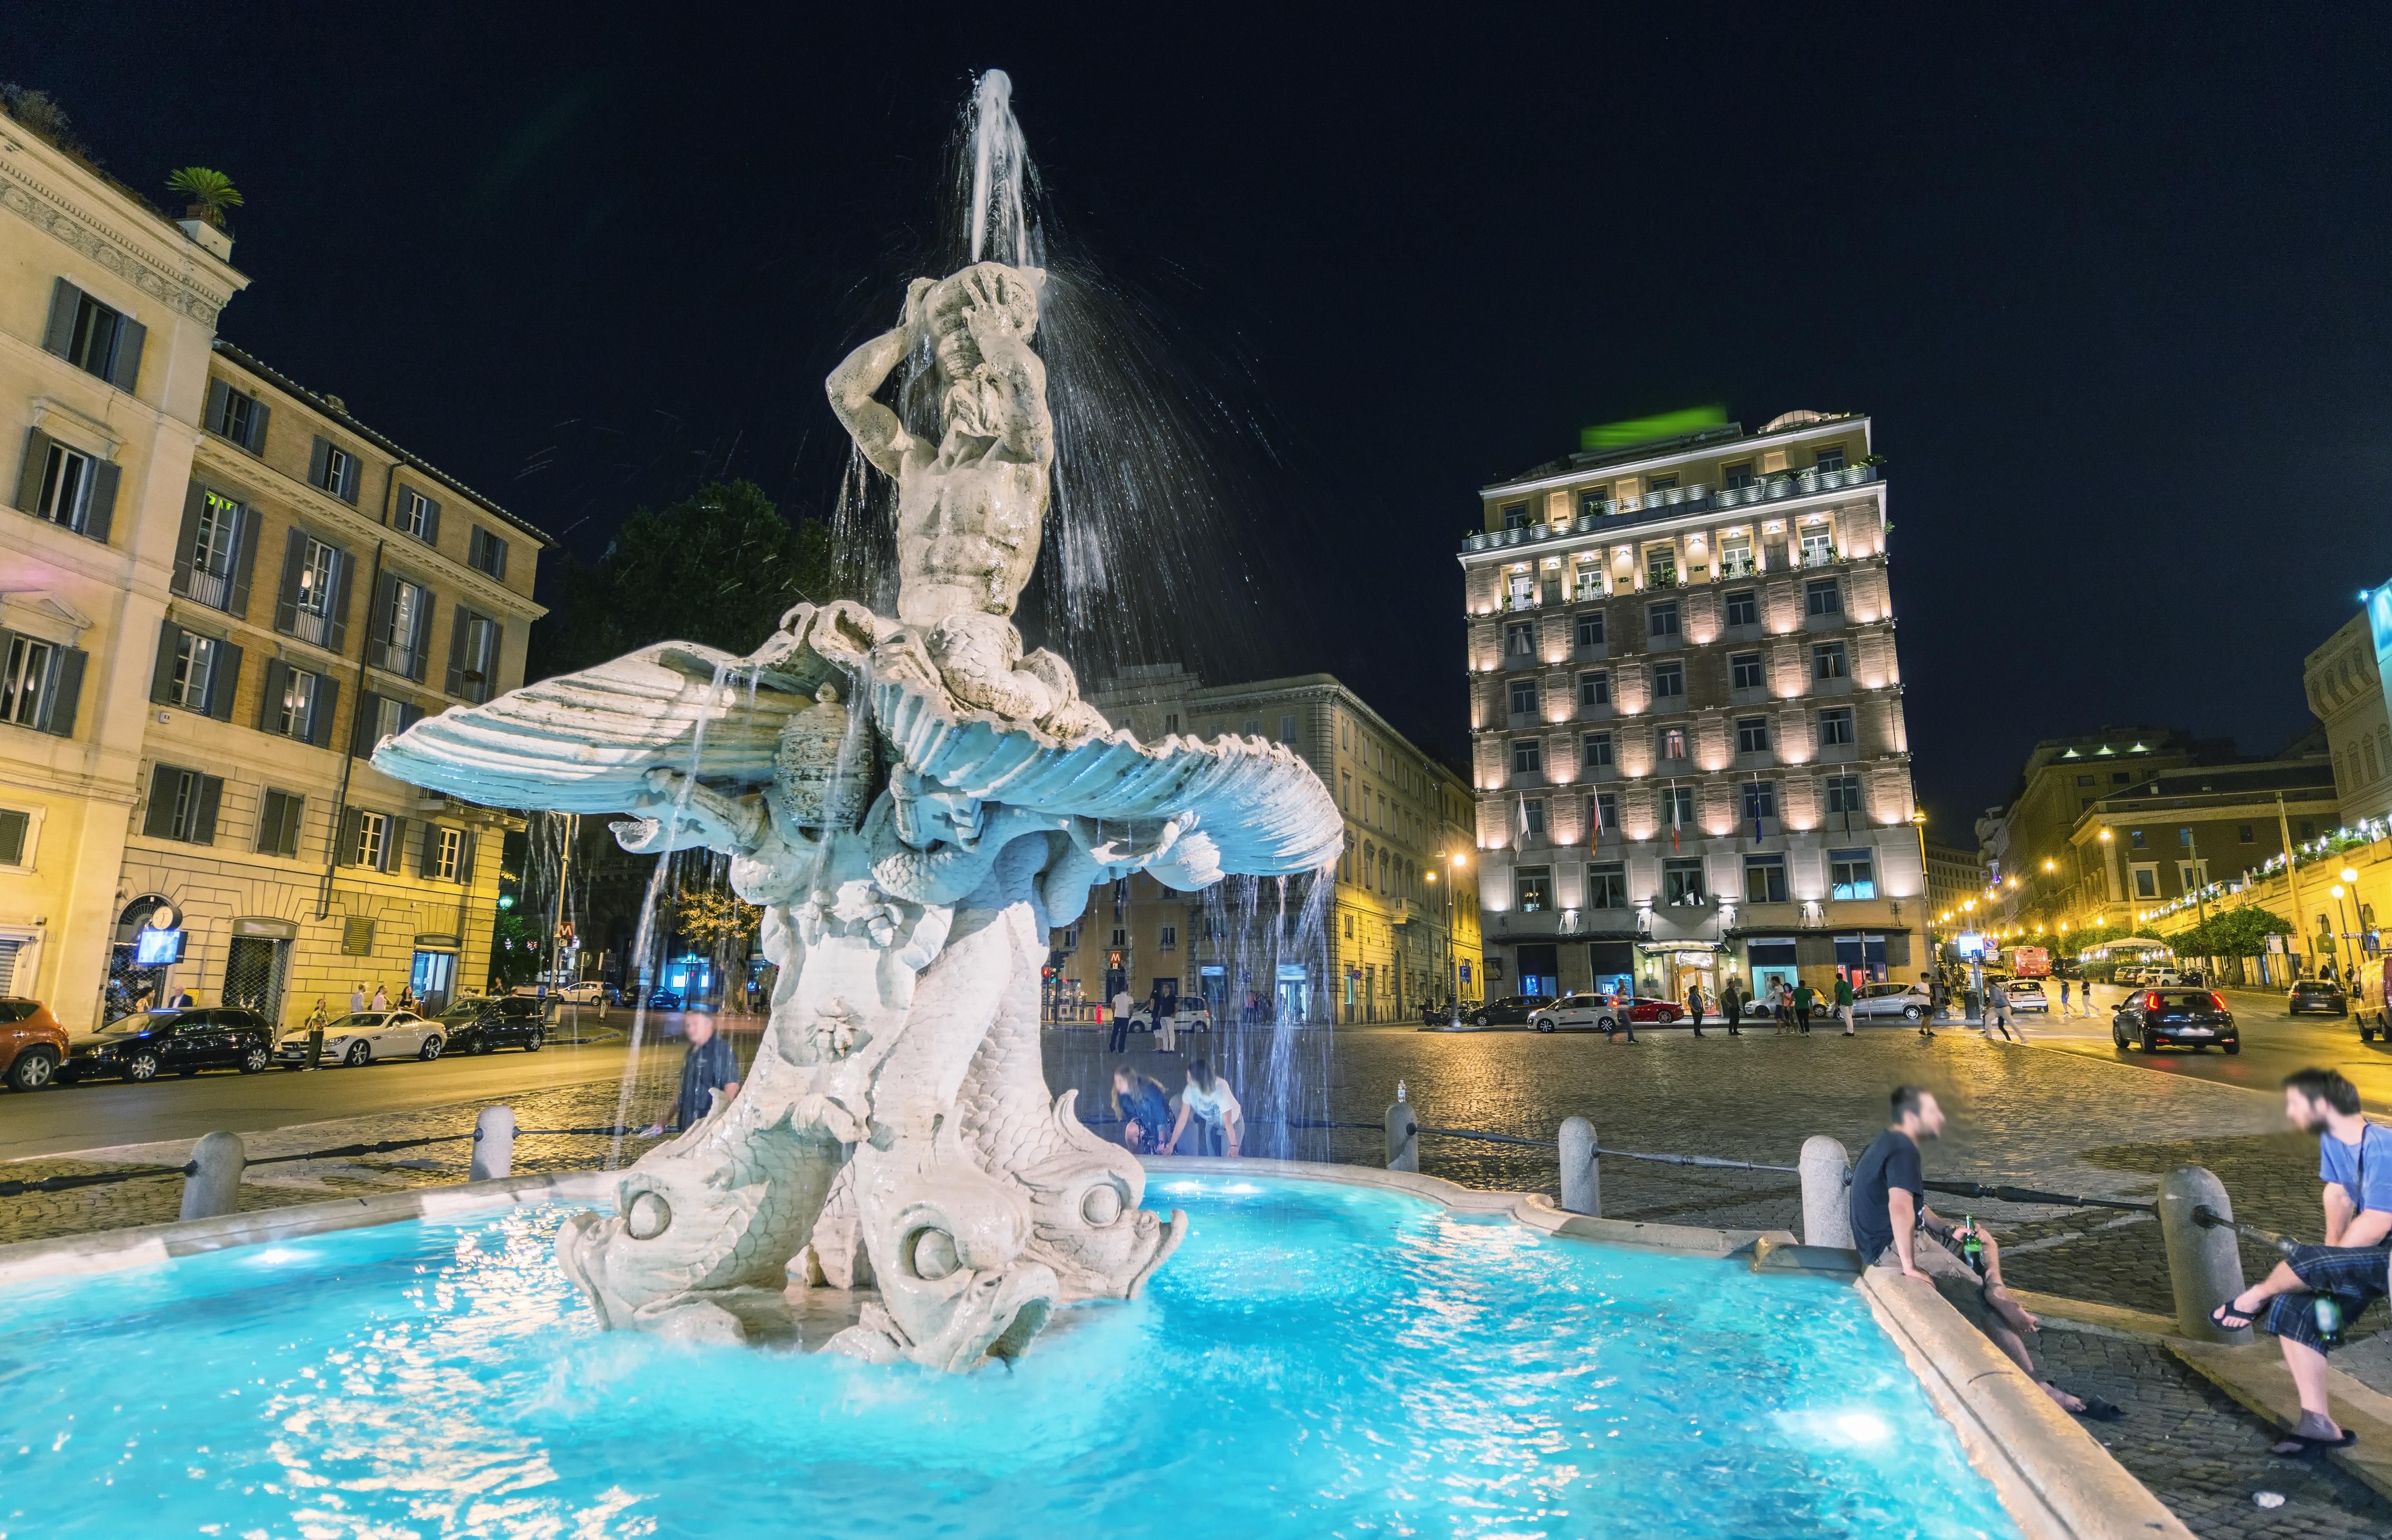 Our meeting point, The Triton fountain